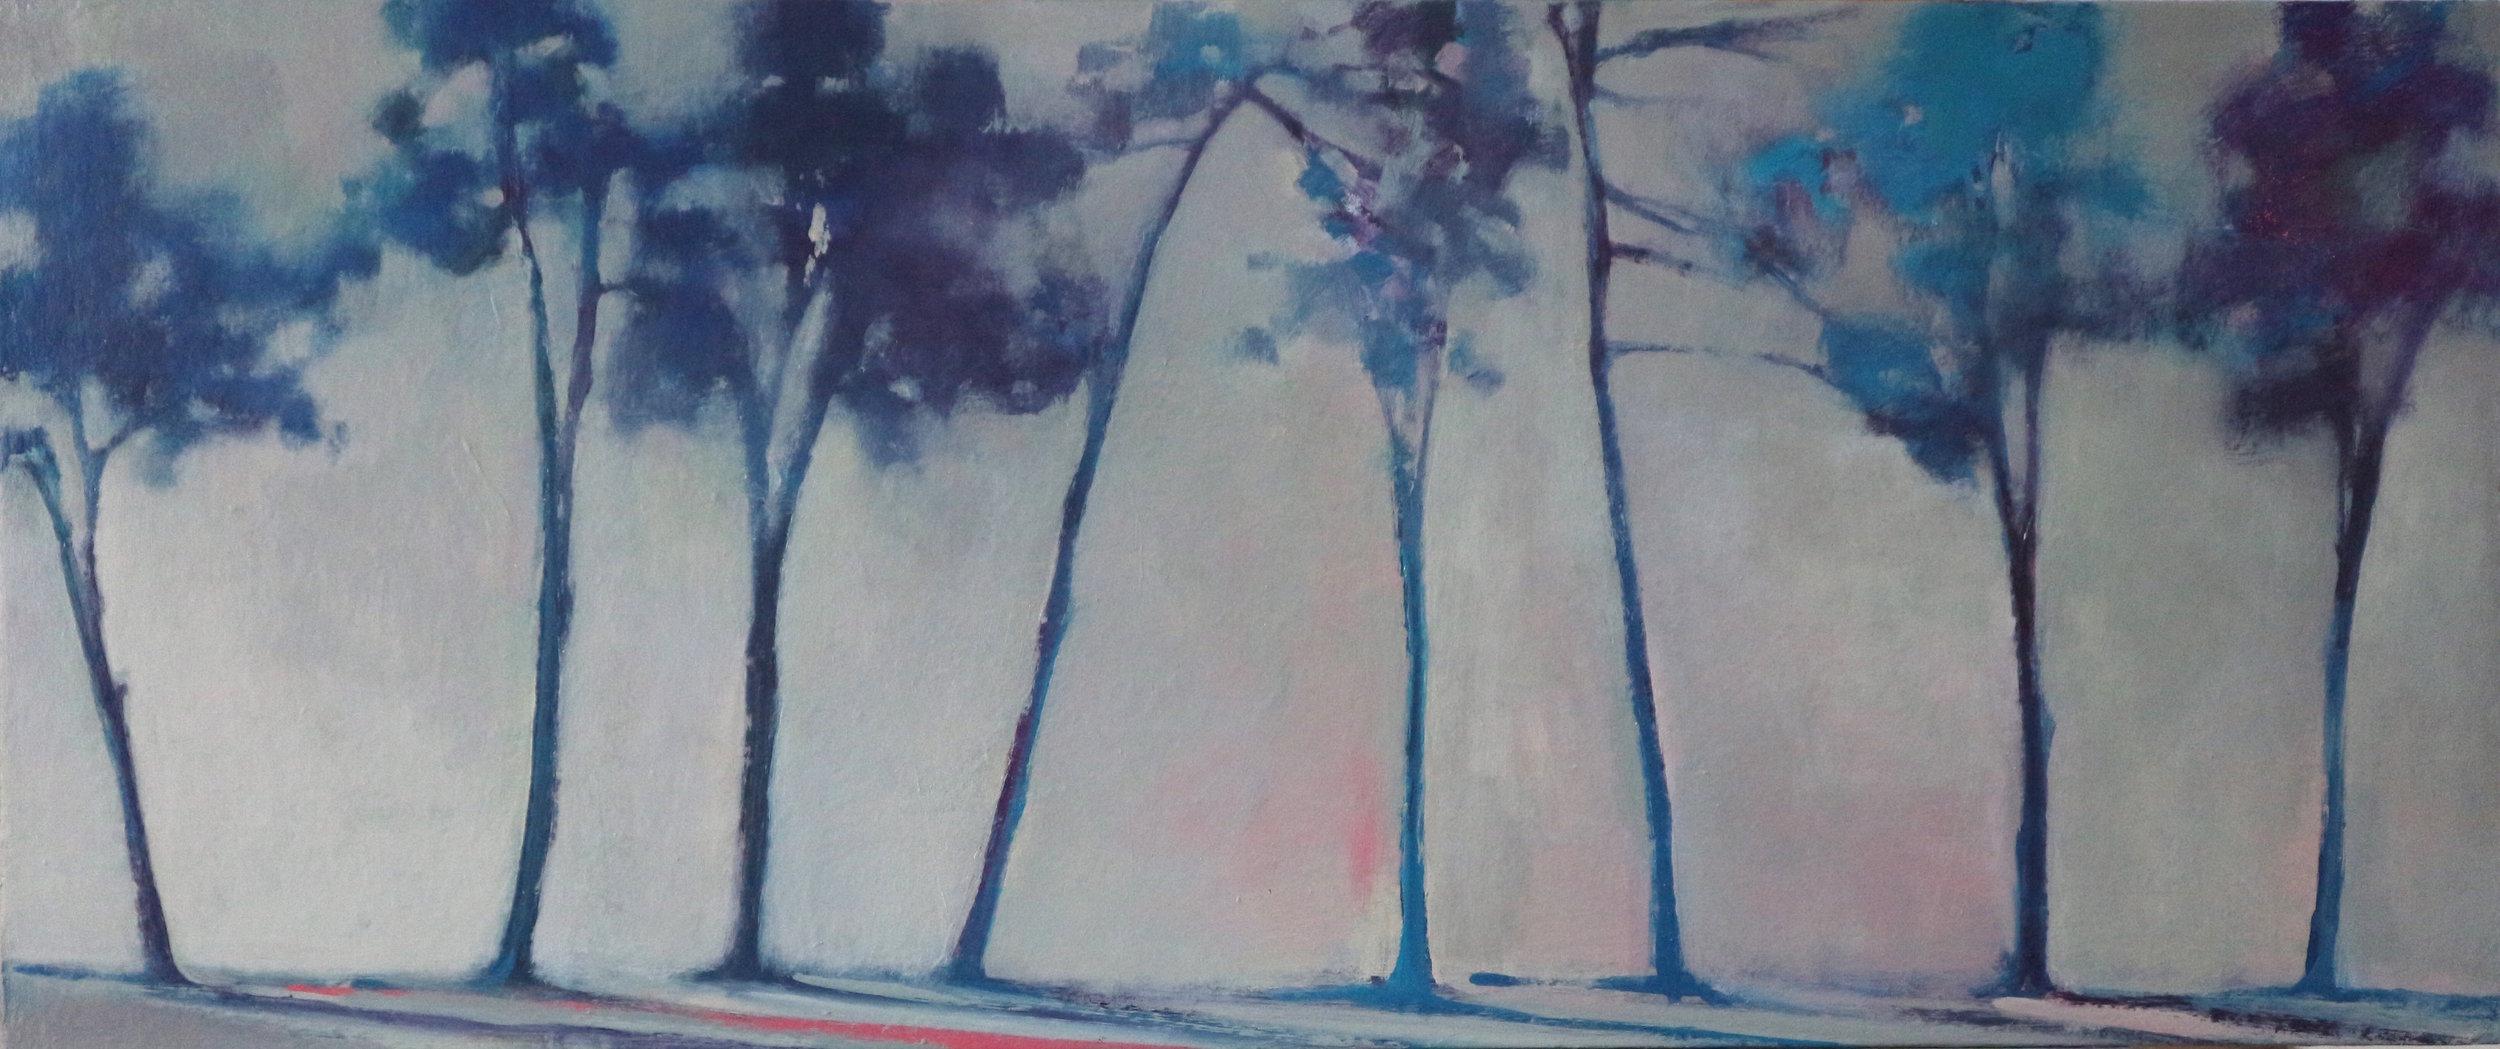 Title: Distant Treeline (II)  Size: 50 x 100 cm  Medium: Oil on canvas  Price: £1550